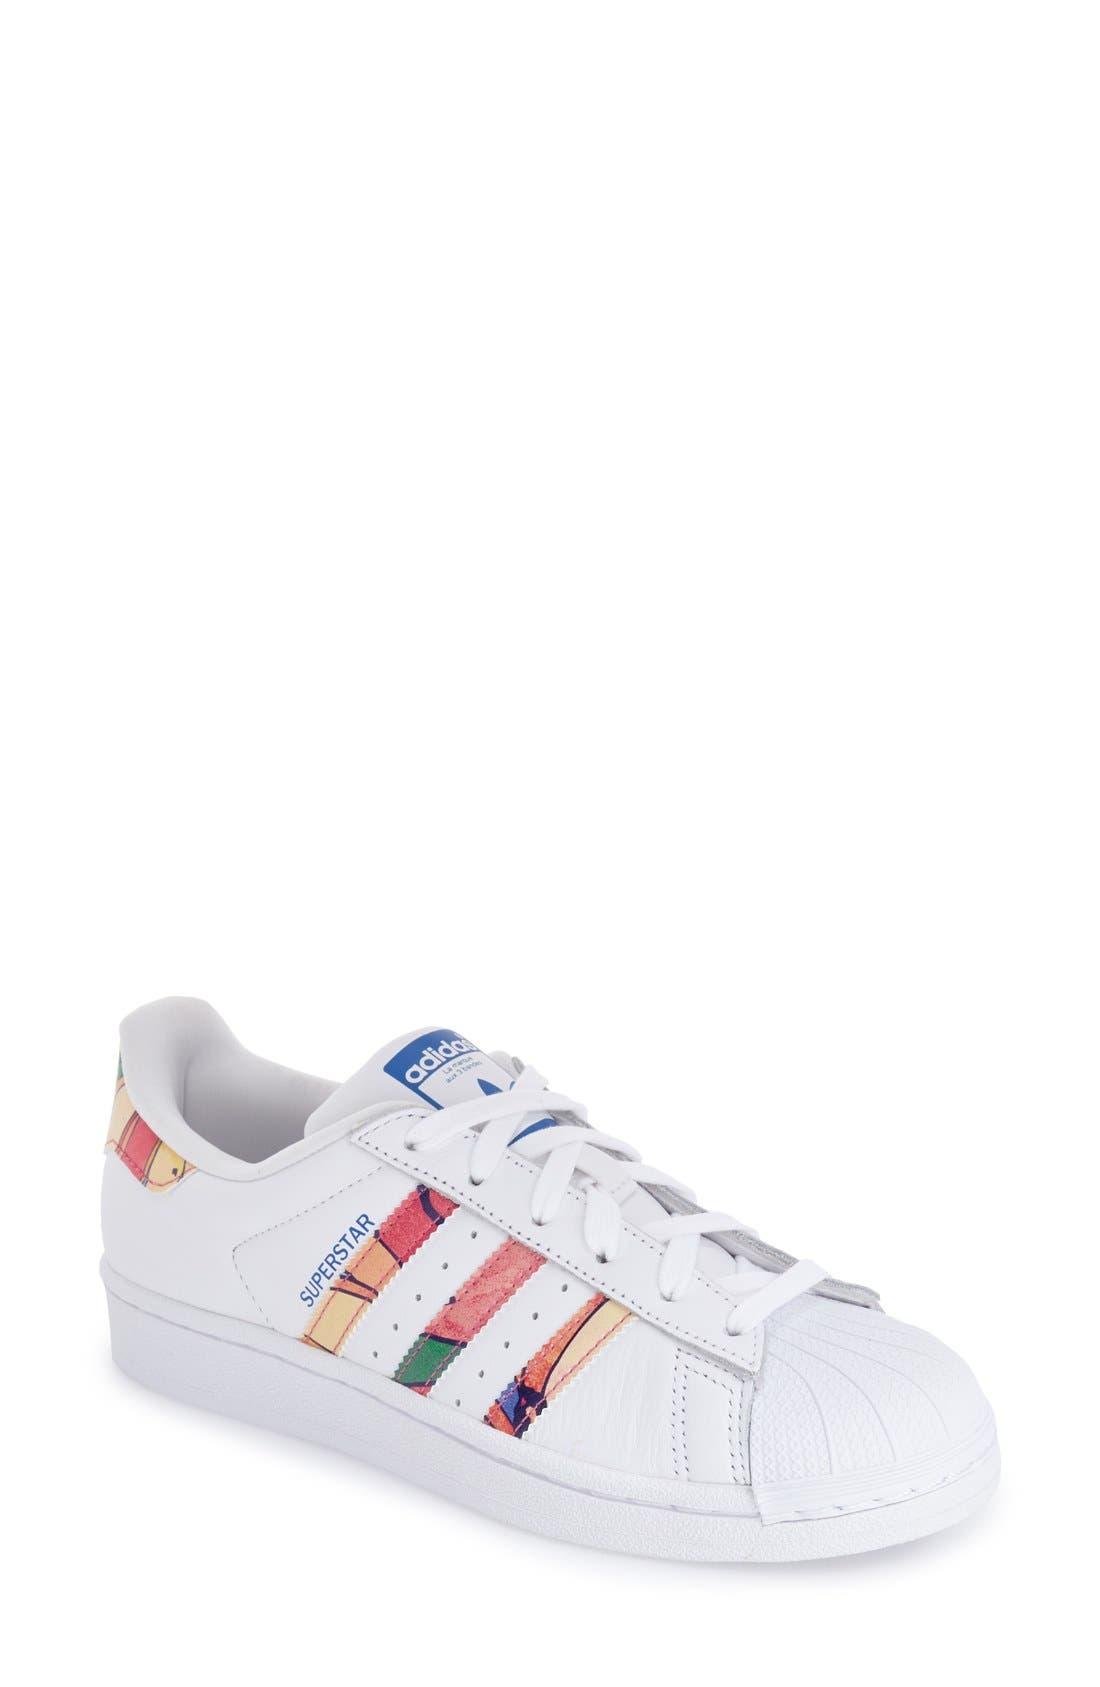 'Superstar' Print Sneaker, Main, color, 107